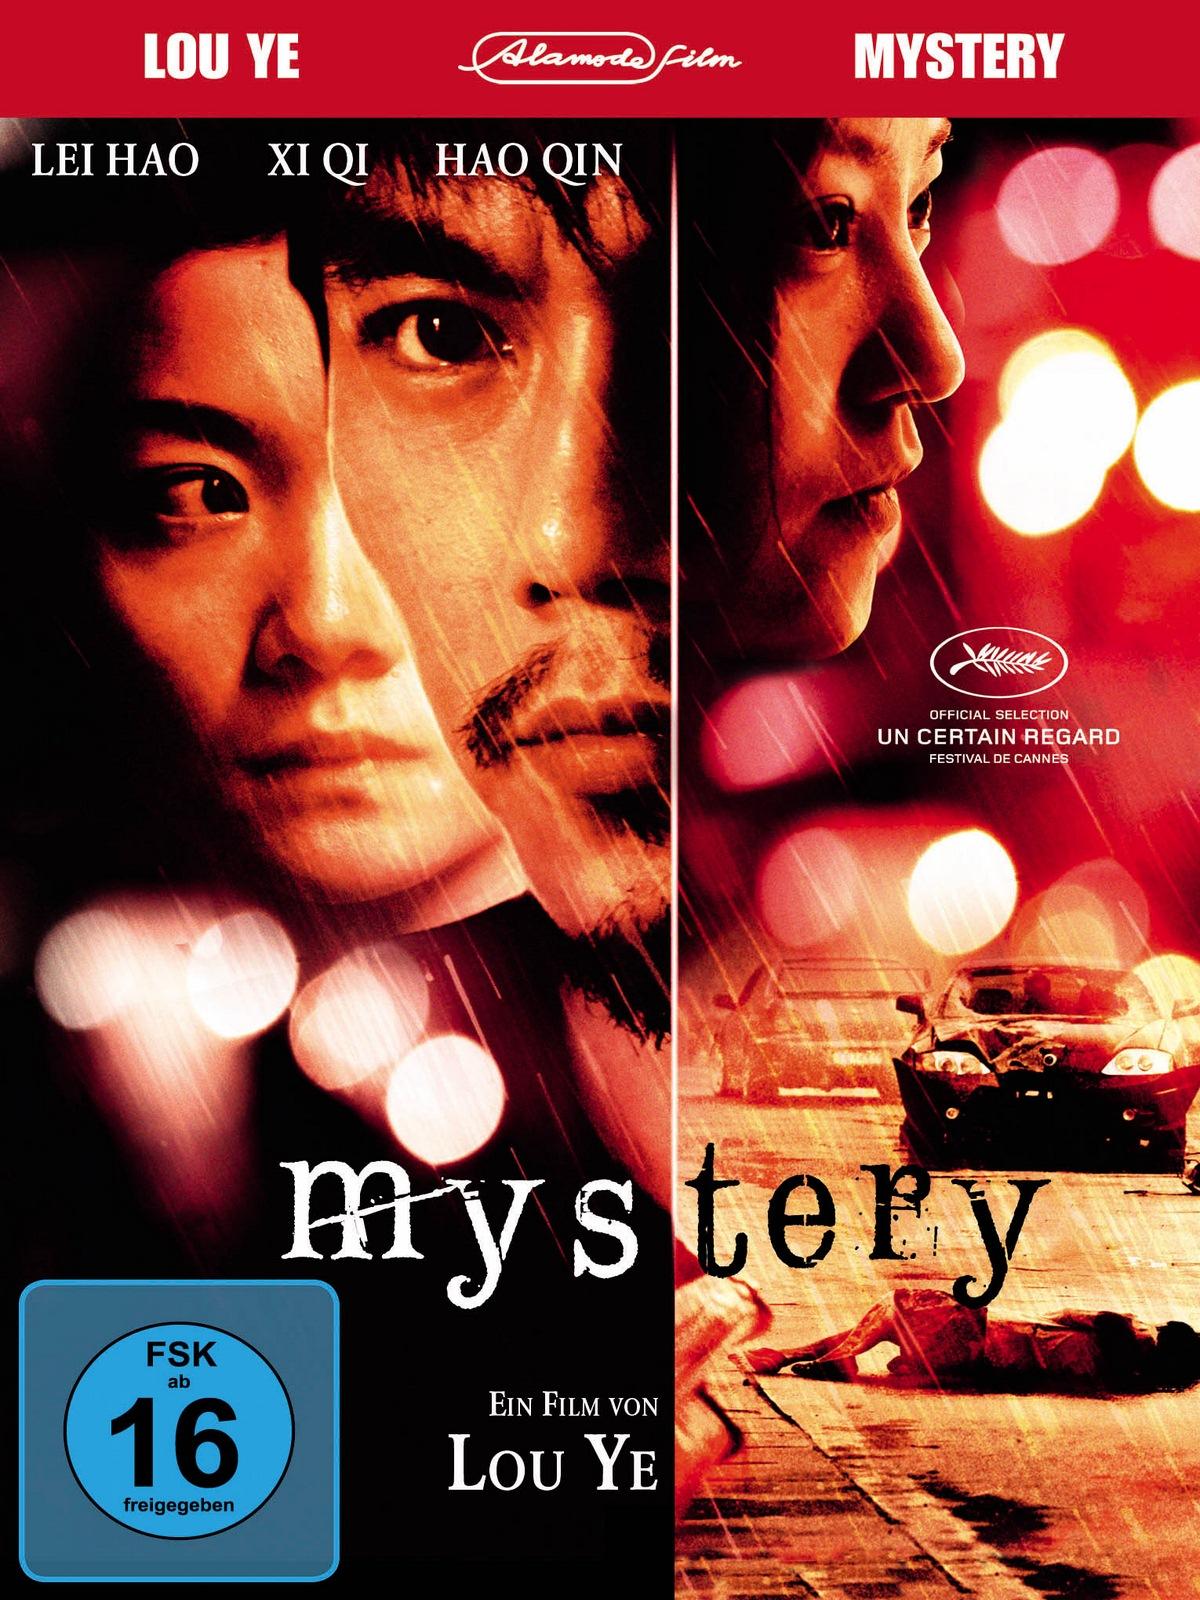 Kinoprogramm Mysteryfilm